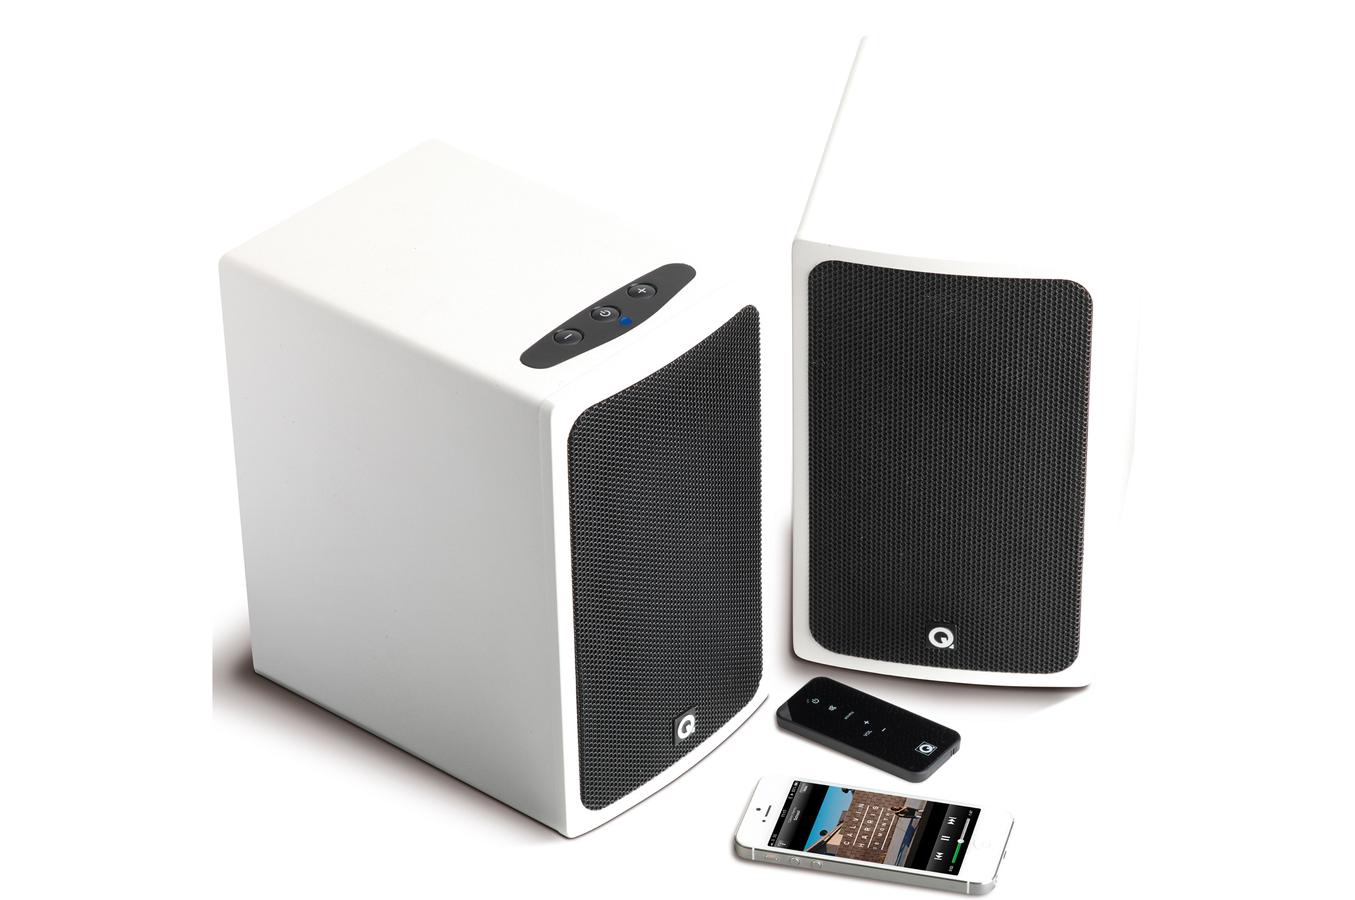 enceinte bluetooth sans fil q acoustics bt3 blanc laque 4156714 darty. Black Bedroom Furniture Sets. Home Design Ideas